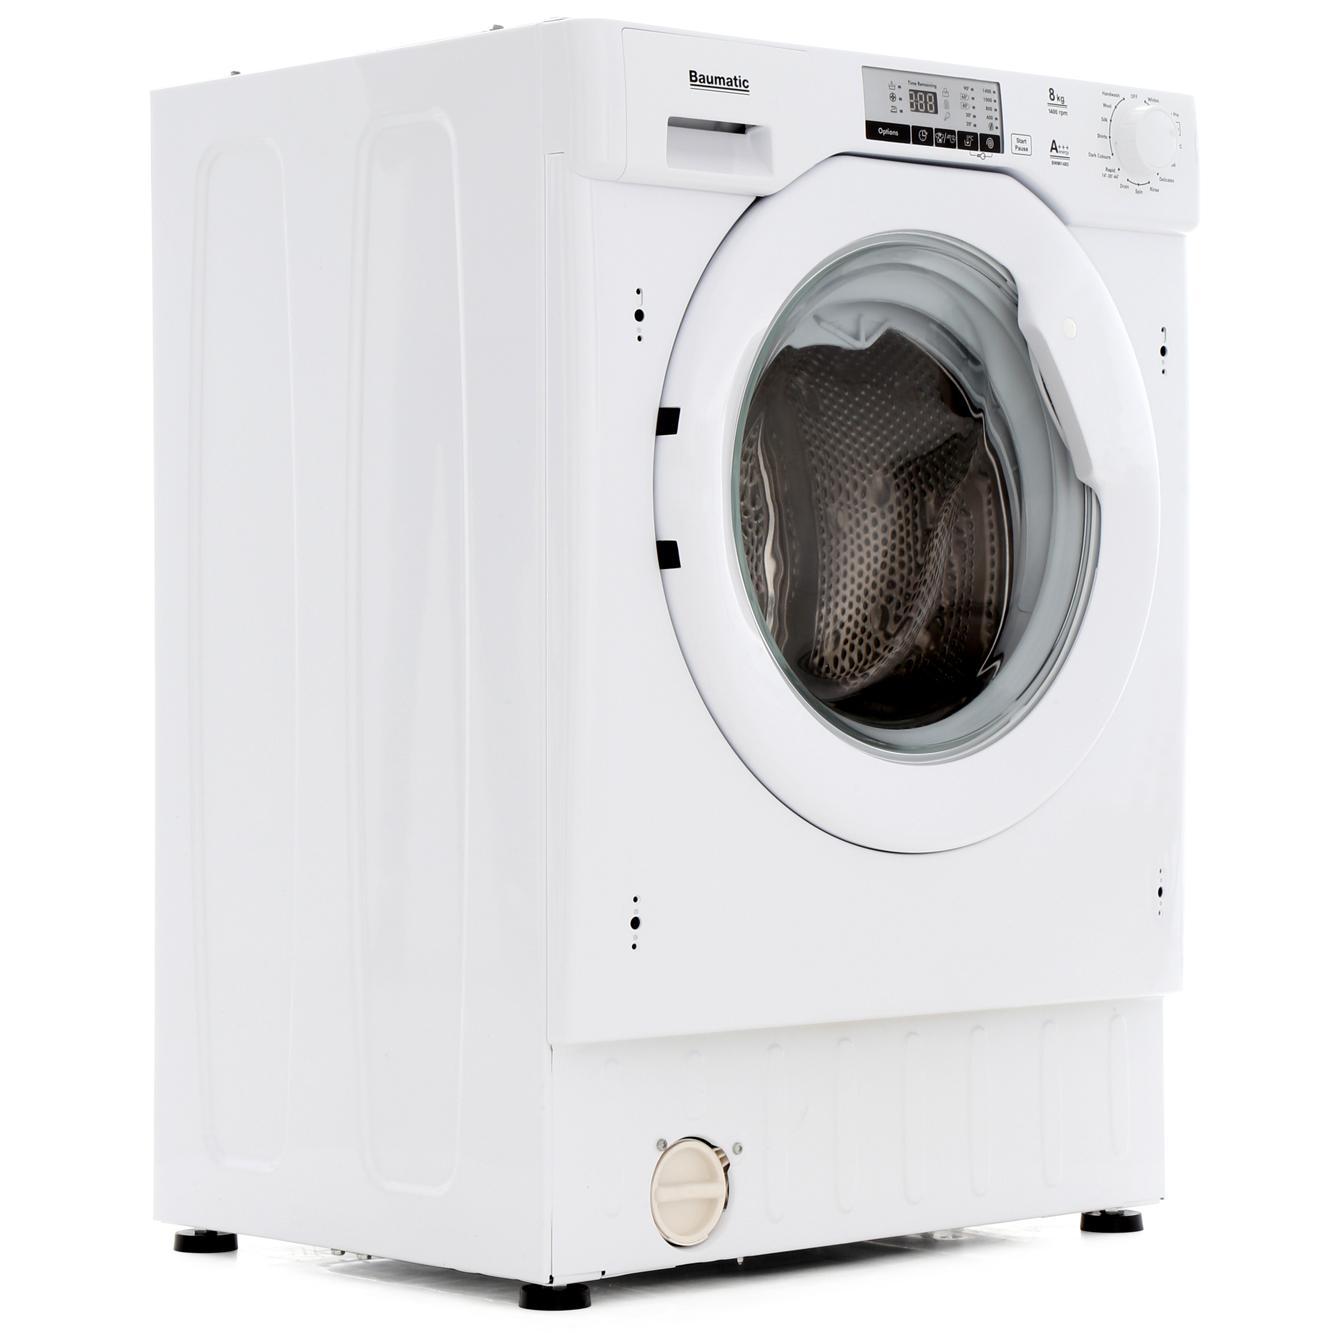 Baumatic BWMI148D-80 Integrated Washing Machine